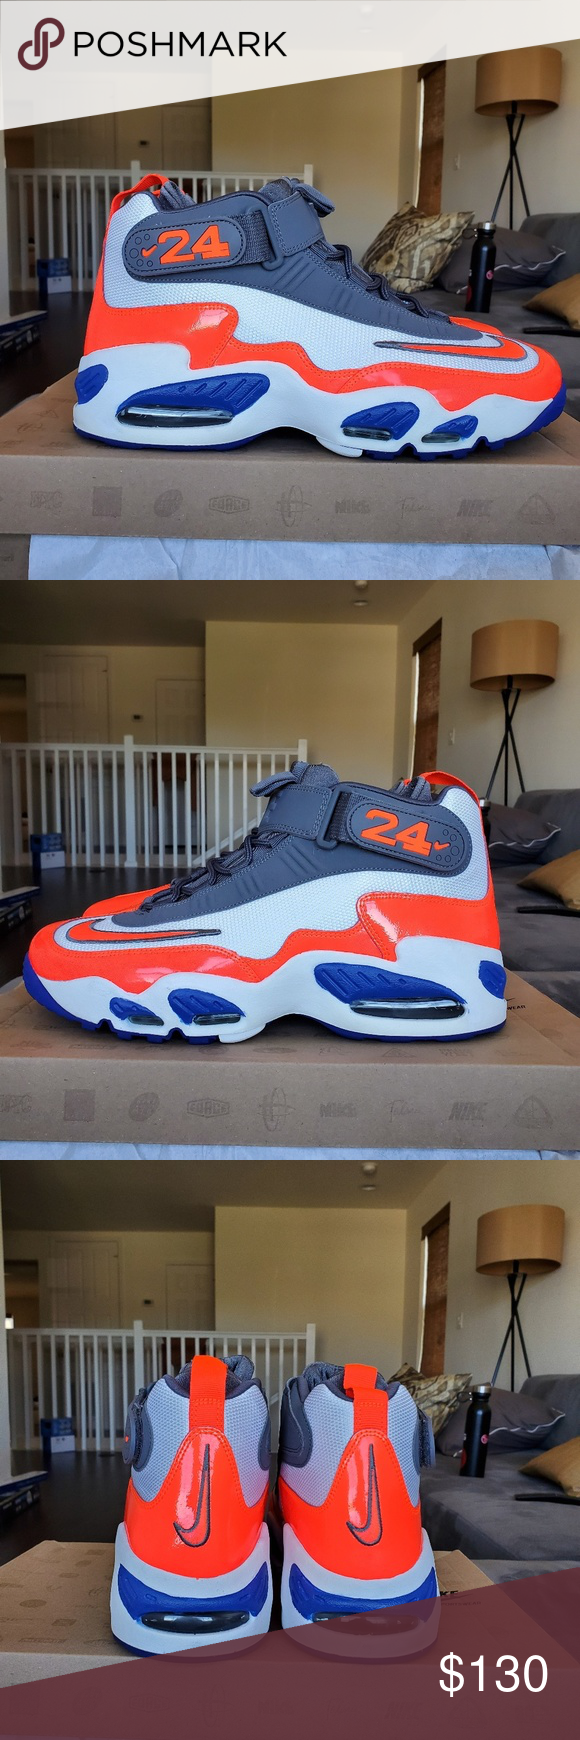 Nike Ken Griffey jr limited edition